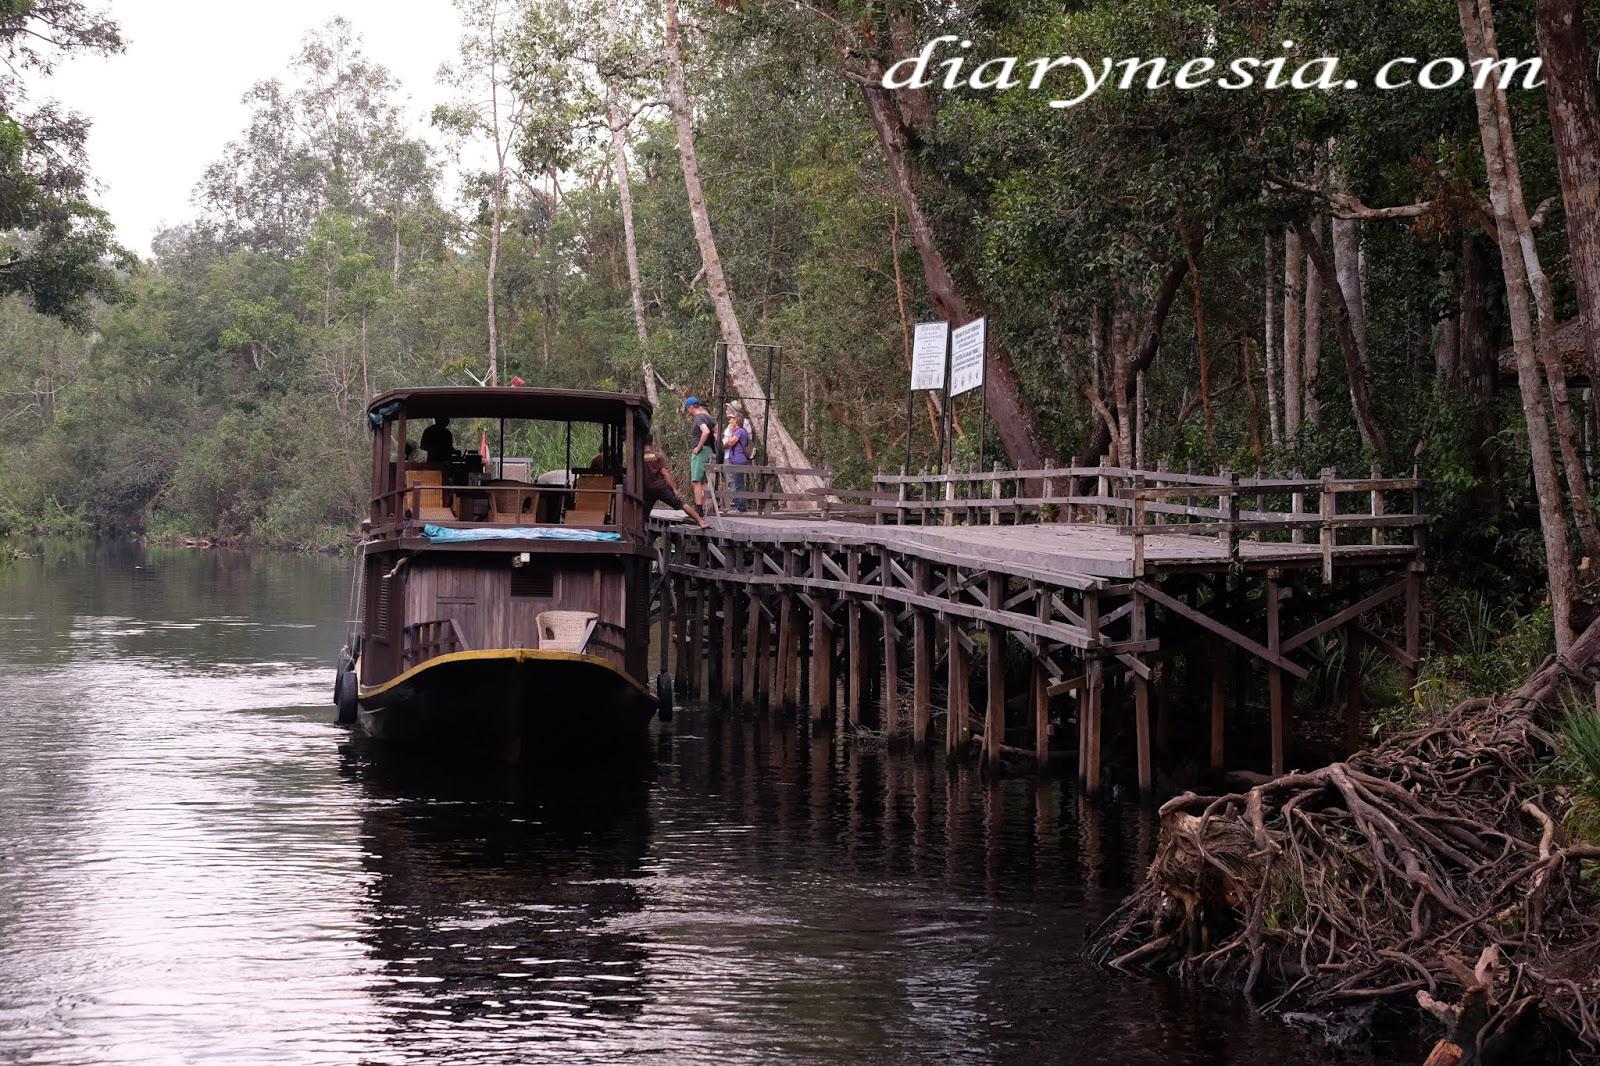 Central Kalimantan tourism, the World's Largest Orangutan Conservation, Central Borneo Tourism, diarynesia